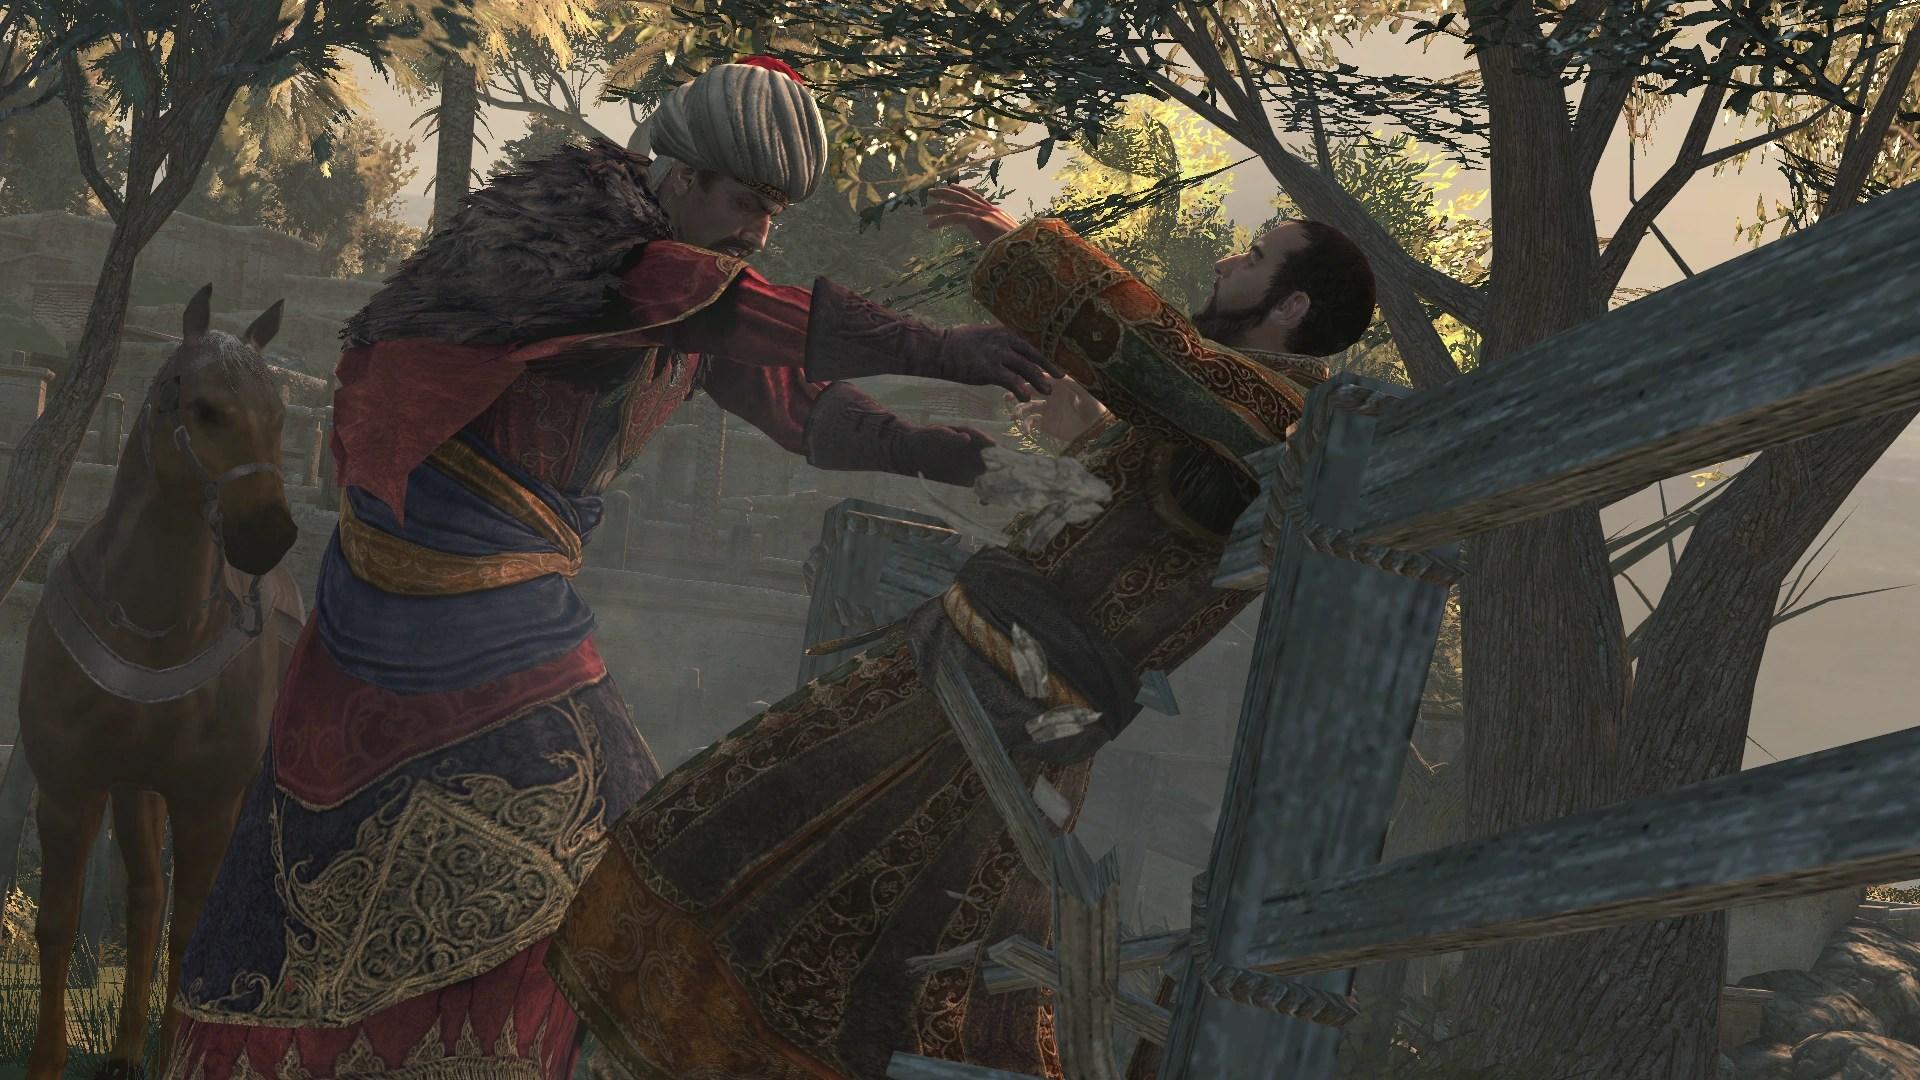 Selim I Assassins Creed Wiki Fandom Powered By Wikia